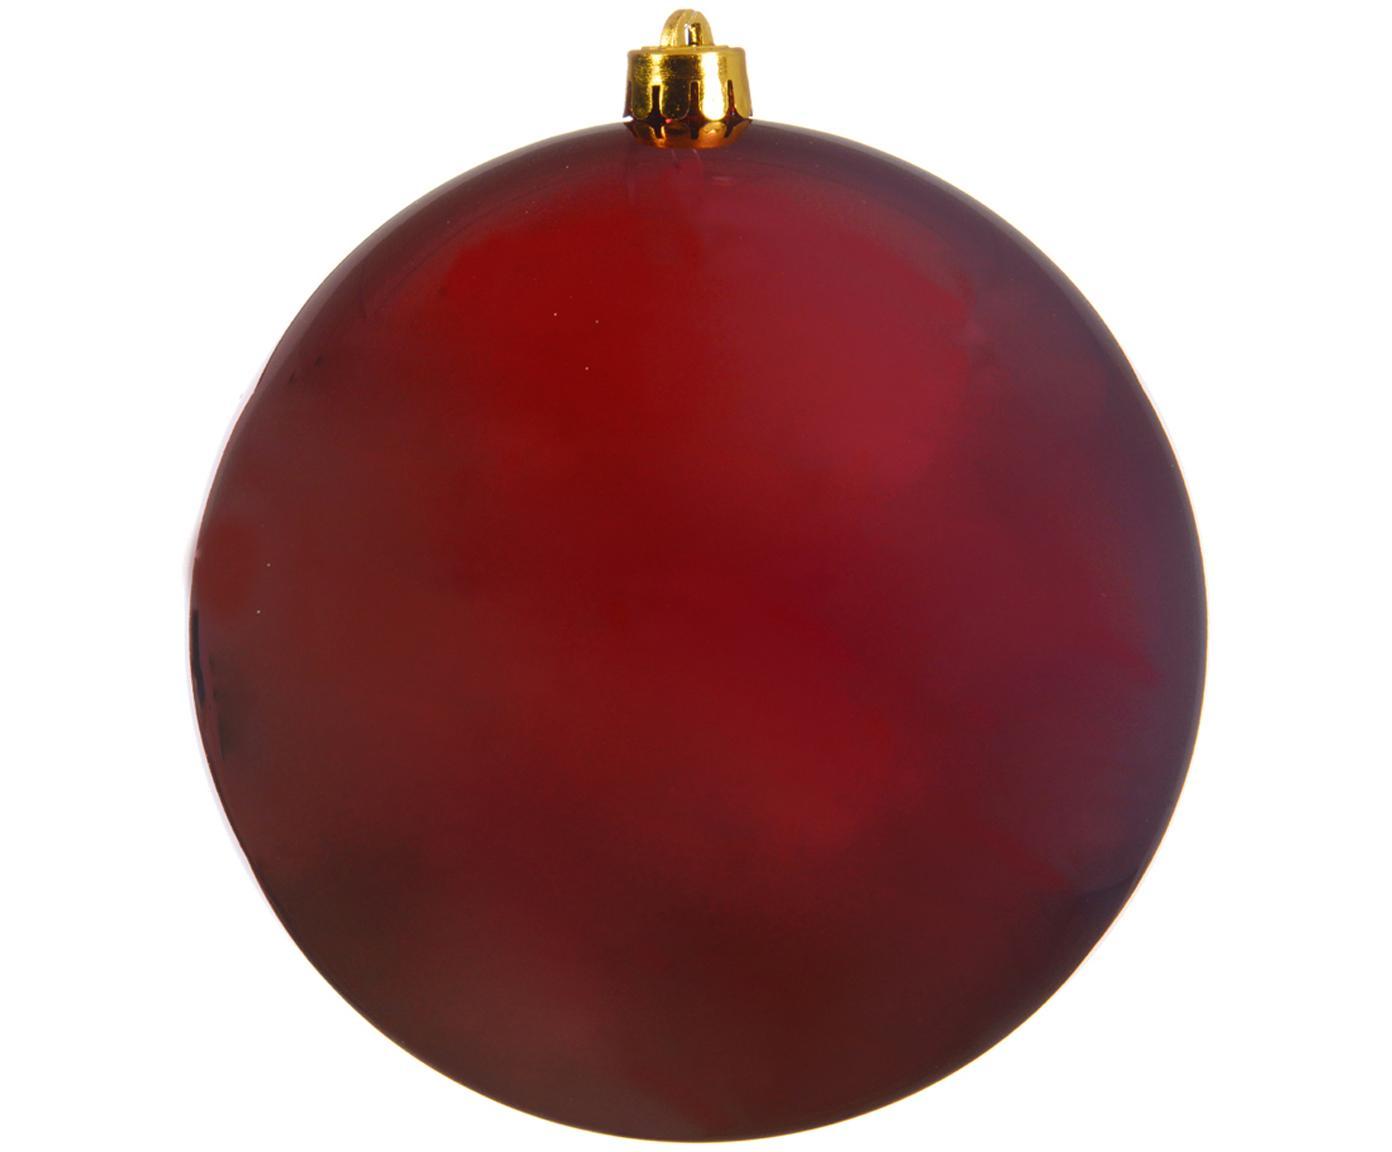 XL Weihnachtskugel Minstix, Kunststoff, Rot, Ø 20 cm